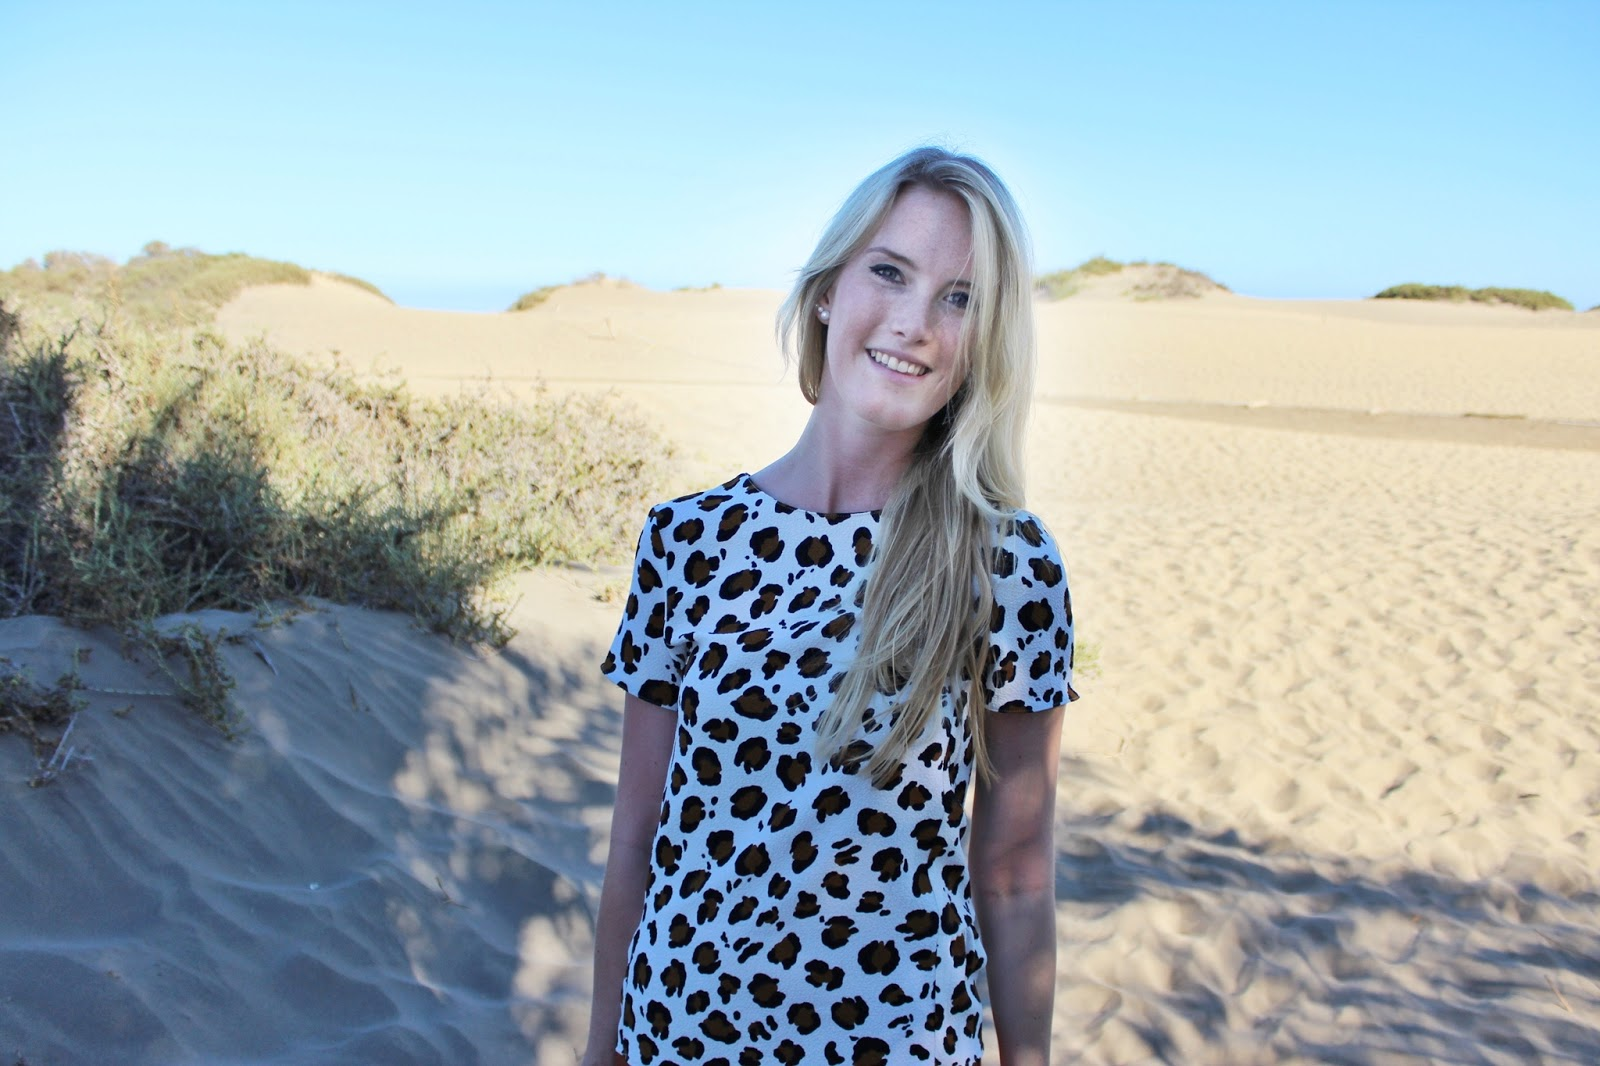 Maspalomas Dünen dunes Leopard Outfit Maxirock TheBlondeLion